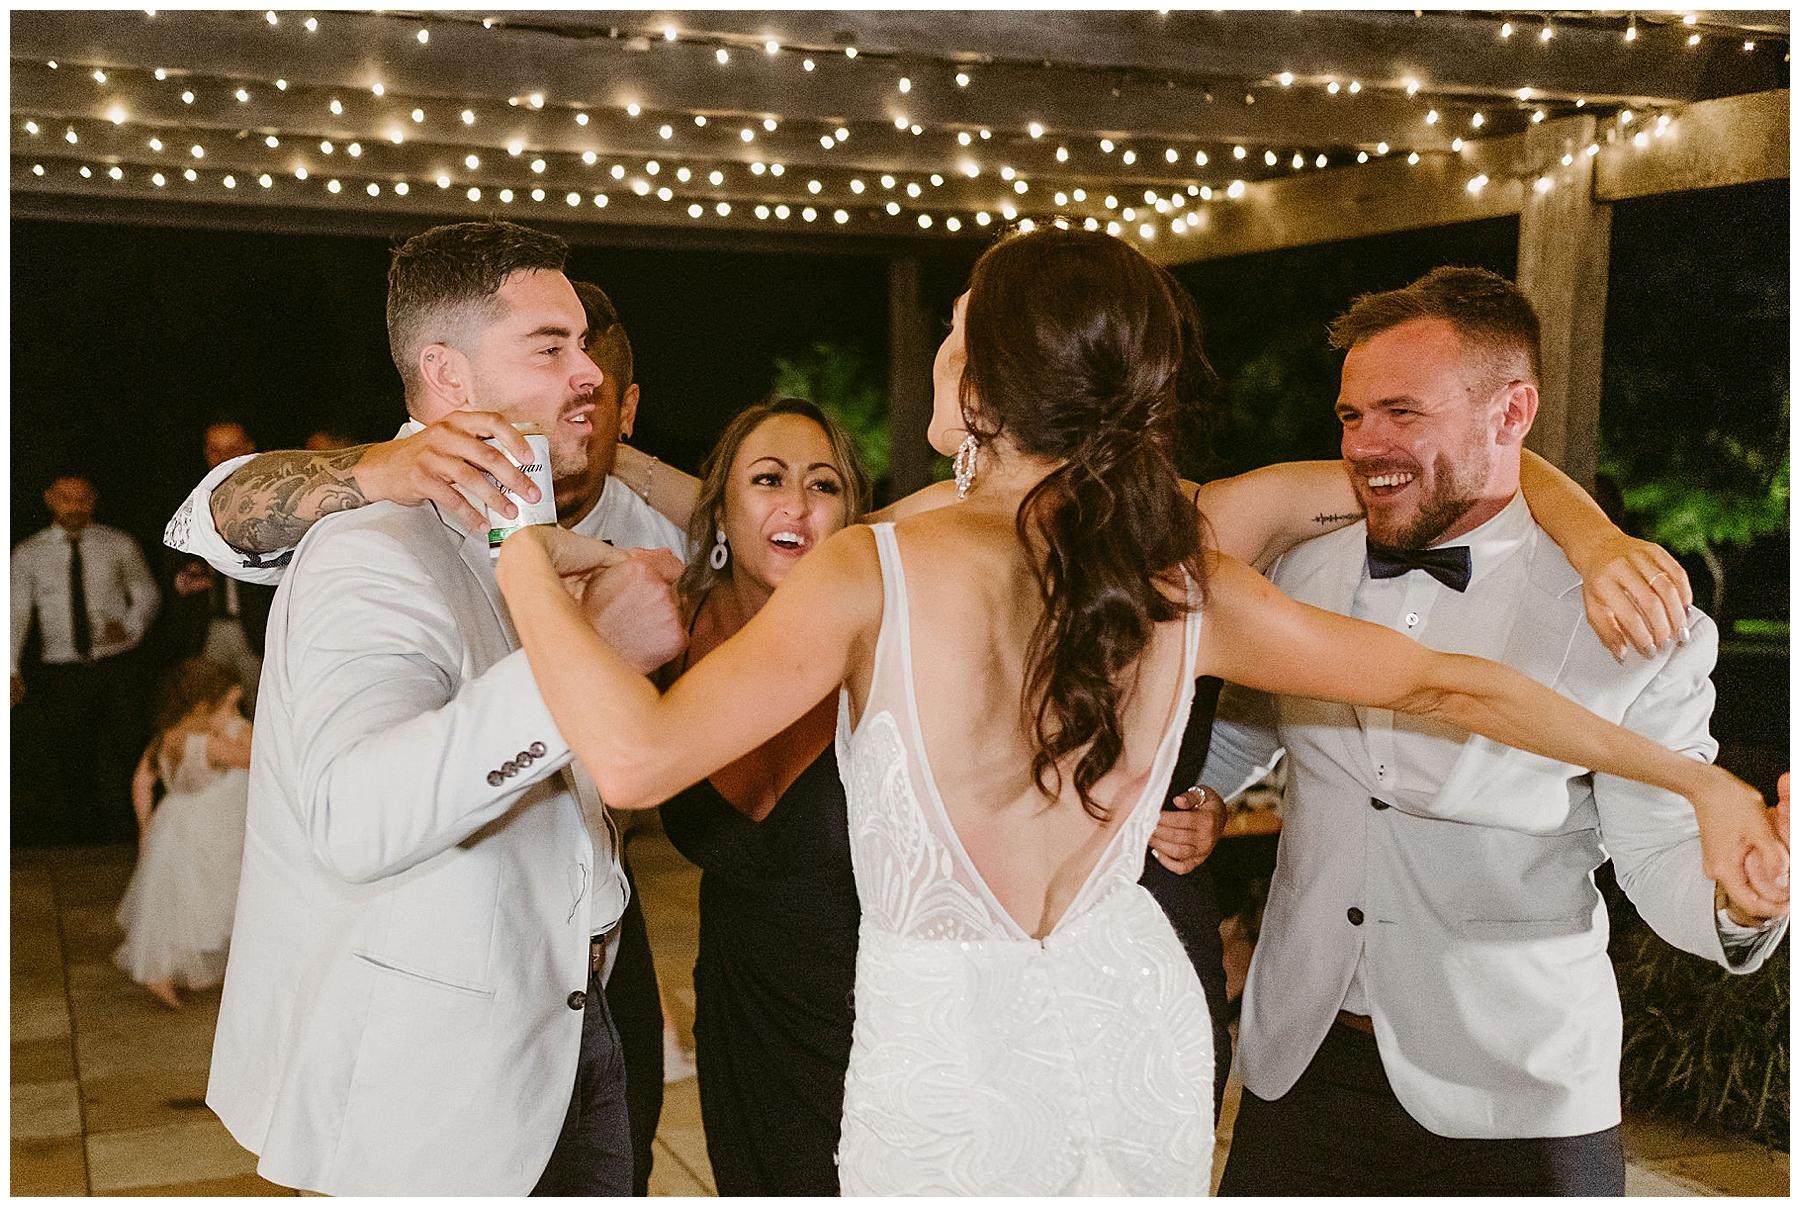 Adam's Peak Wedding Photos + Popcorn Photography_0078.jpg